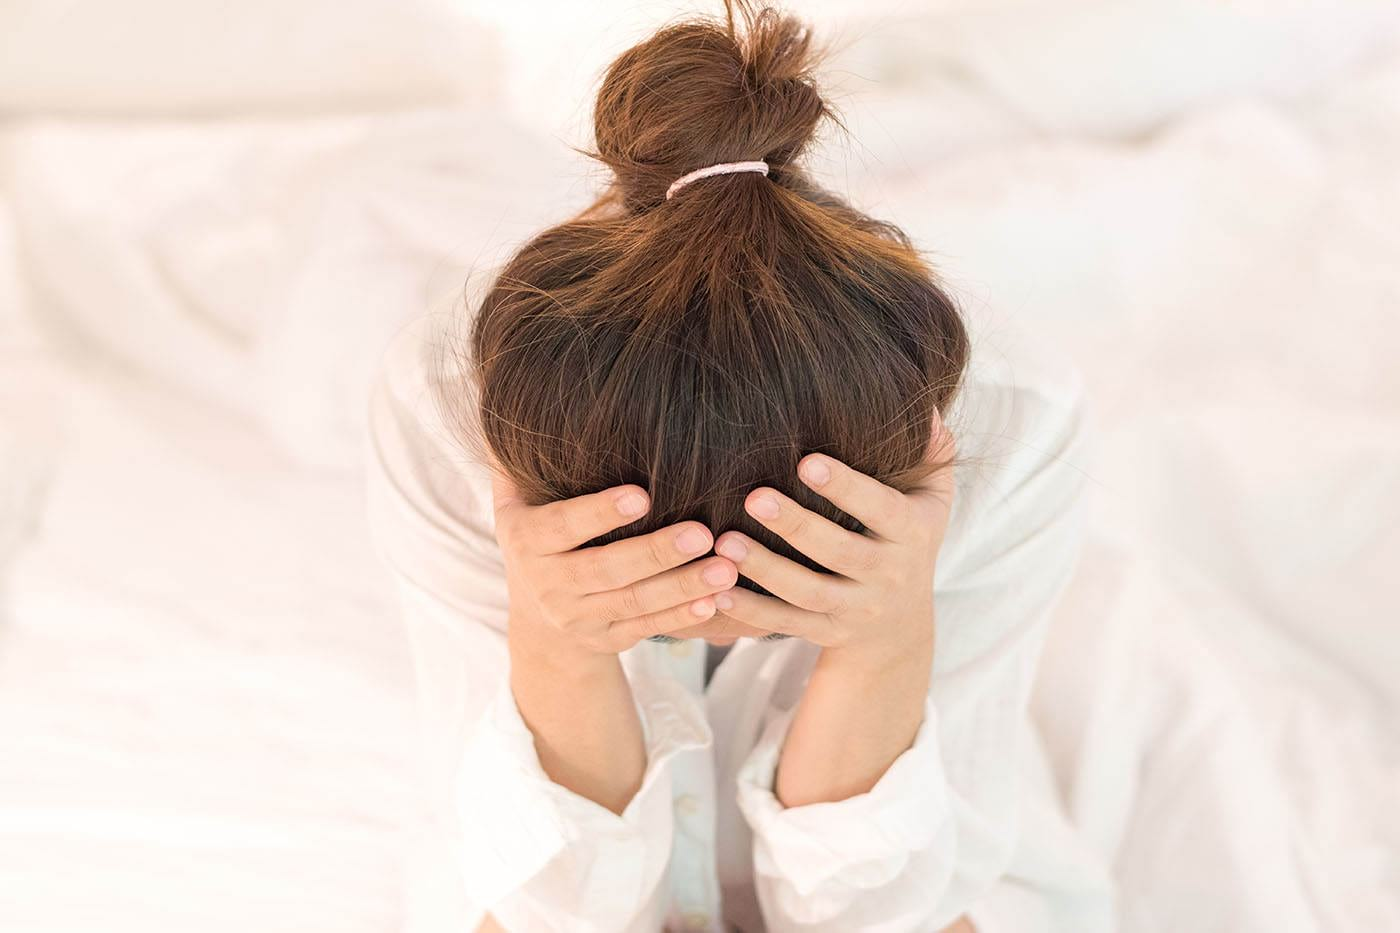 Ketamina poate combate efectele depresiei severe [studiu]